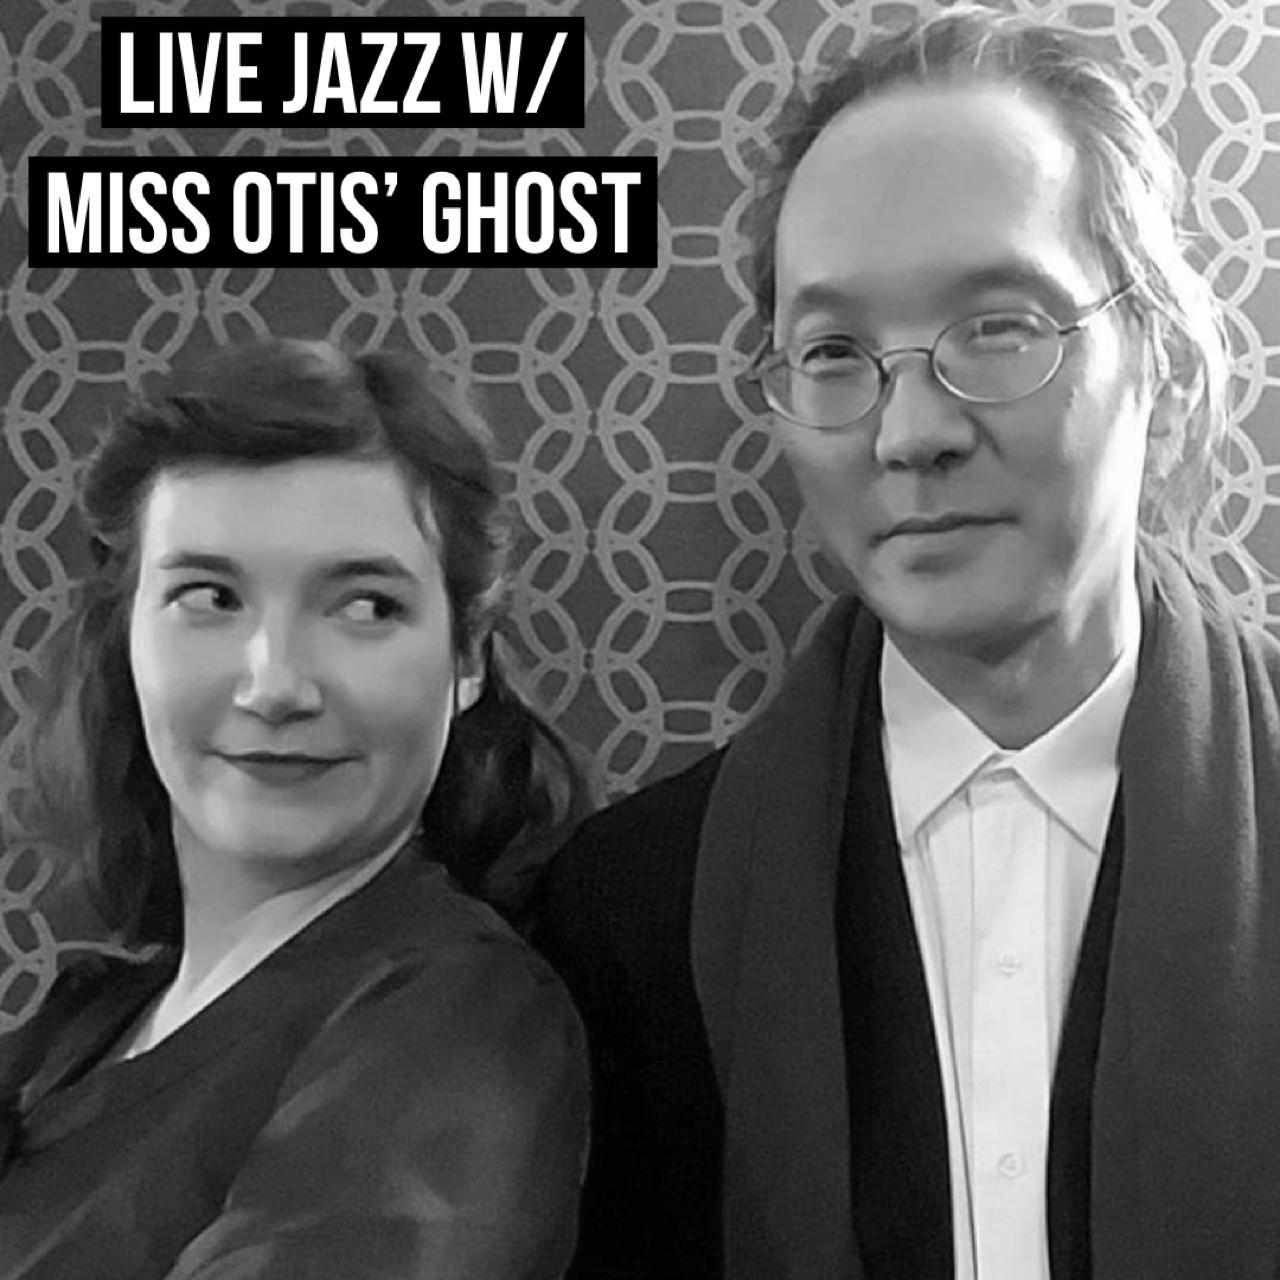 Live Jazz w/ Miss Otis' Ghost